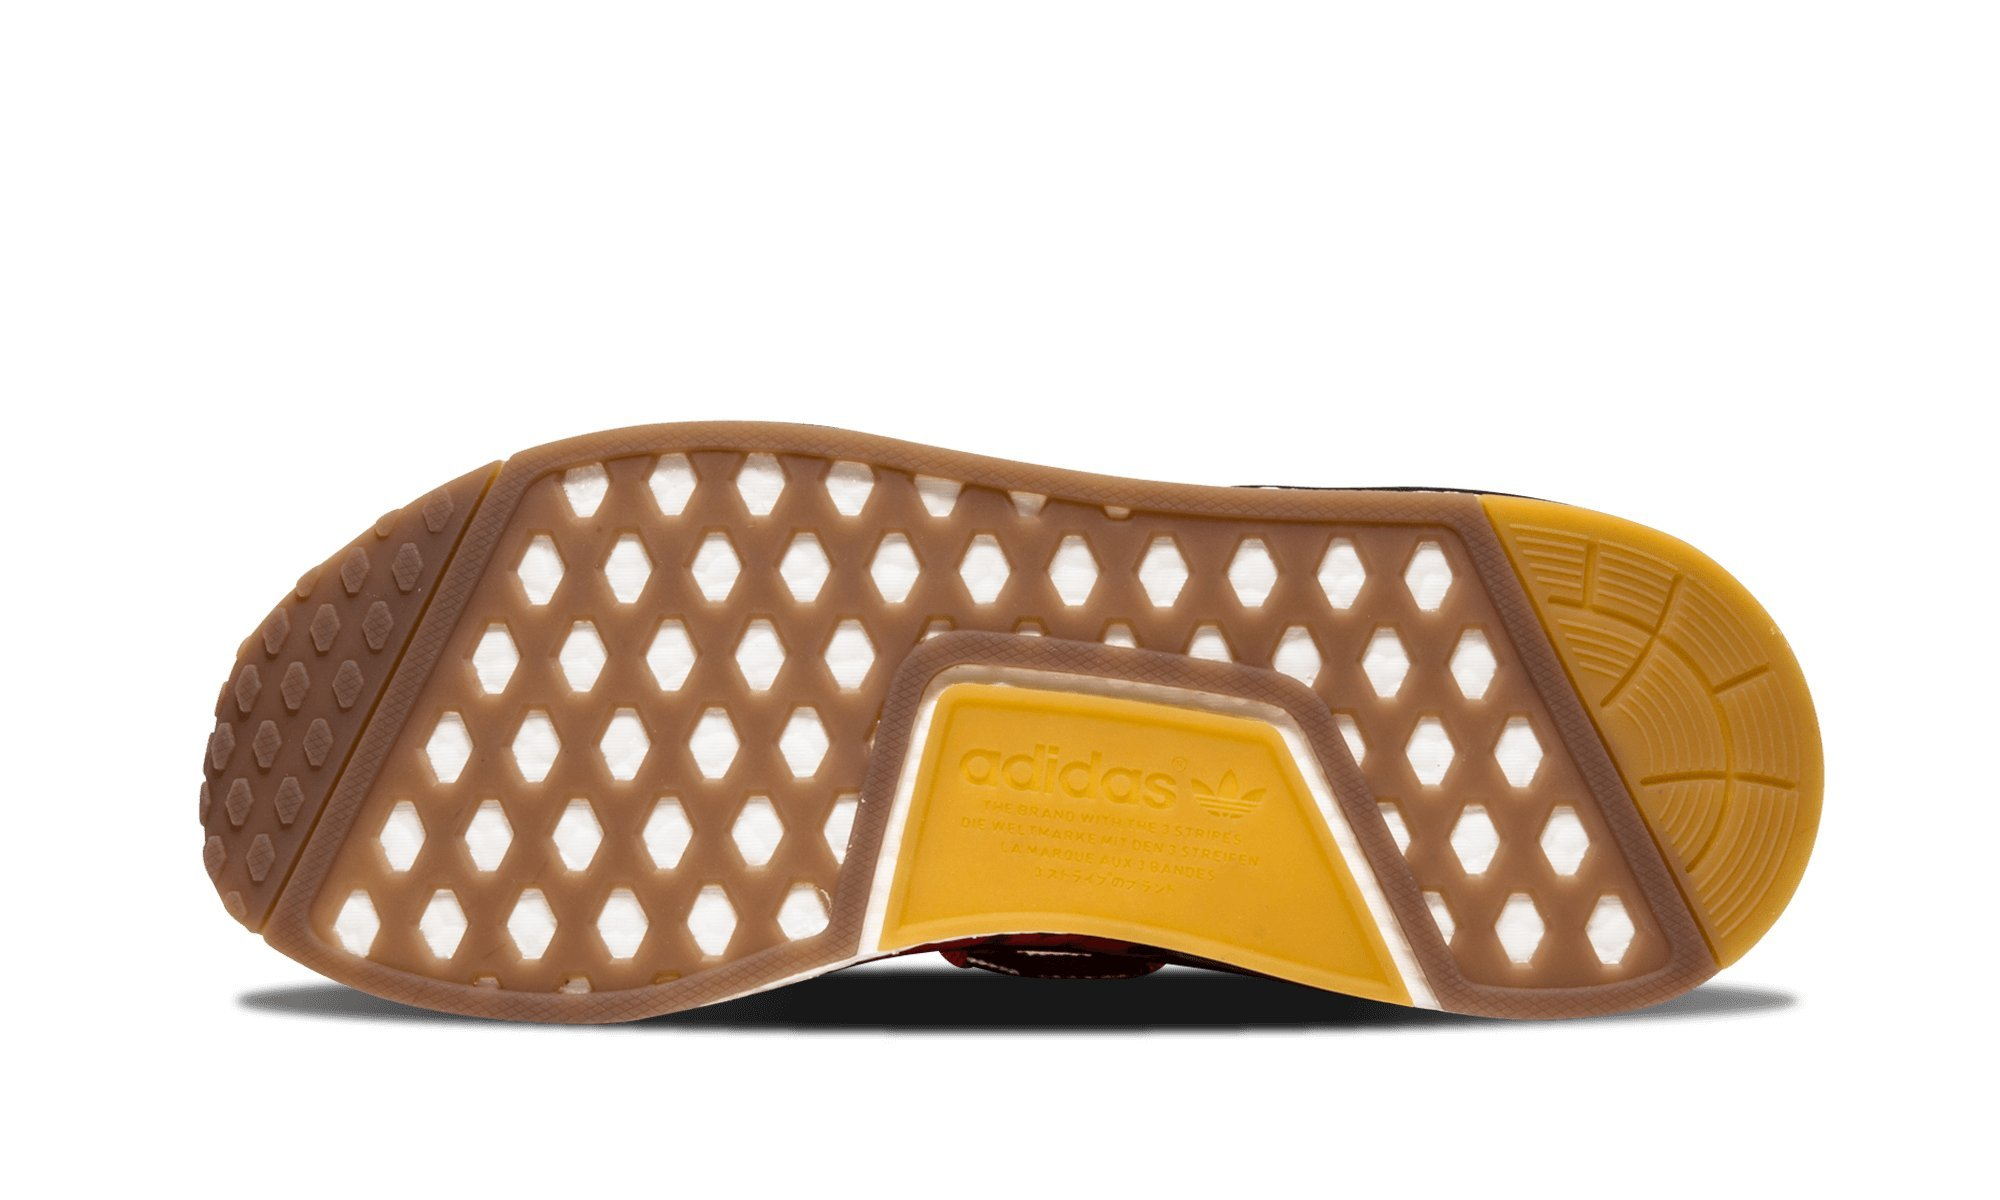 uomini è adidas nmd r1 pk belle scarpe scarpe da corsa aq4791, cred